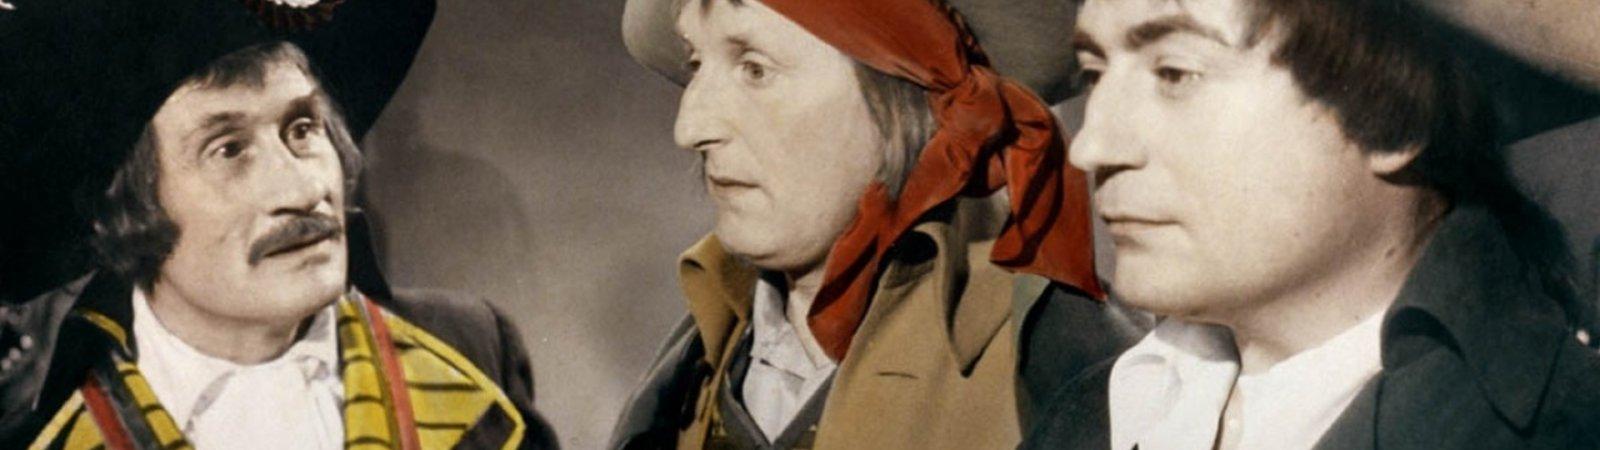 Photo du film : Cadet rousselle